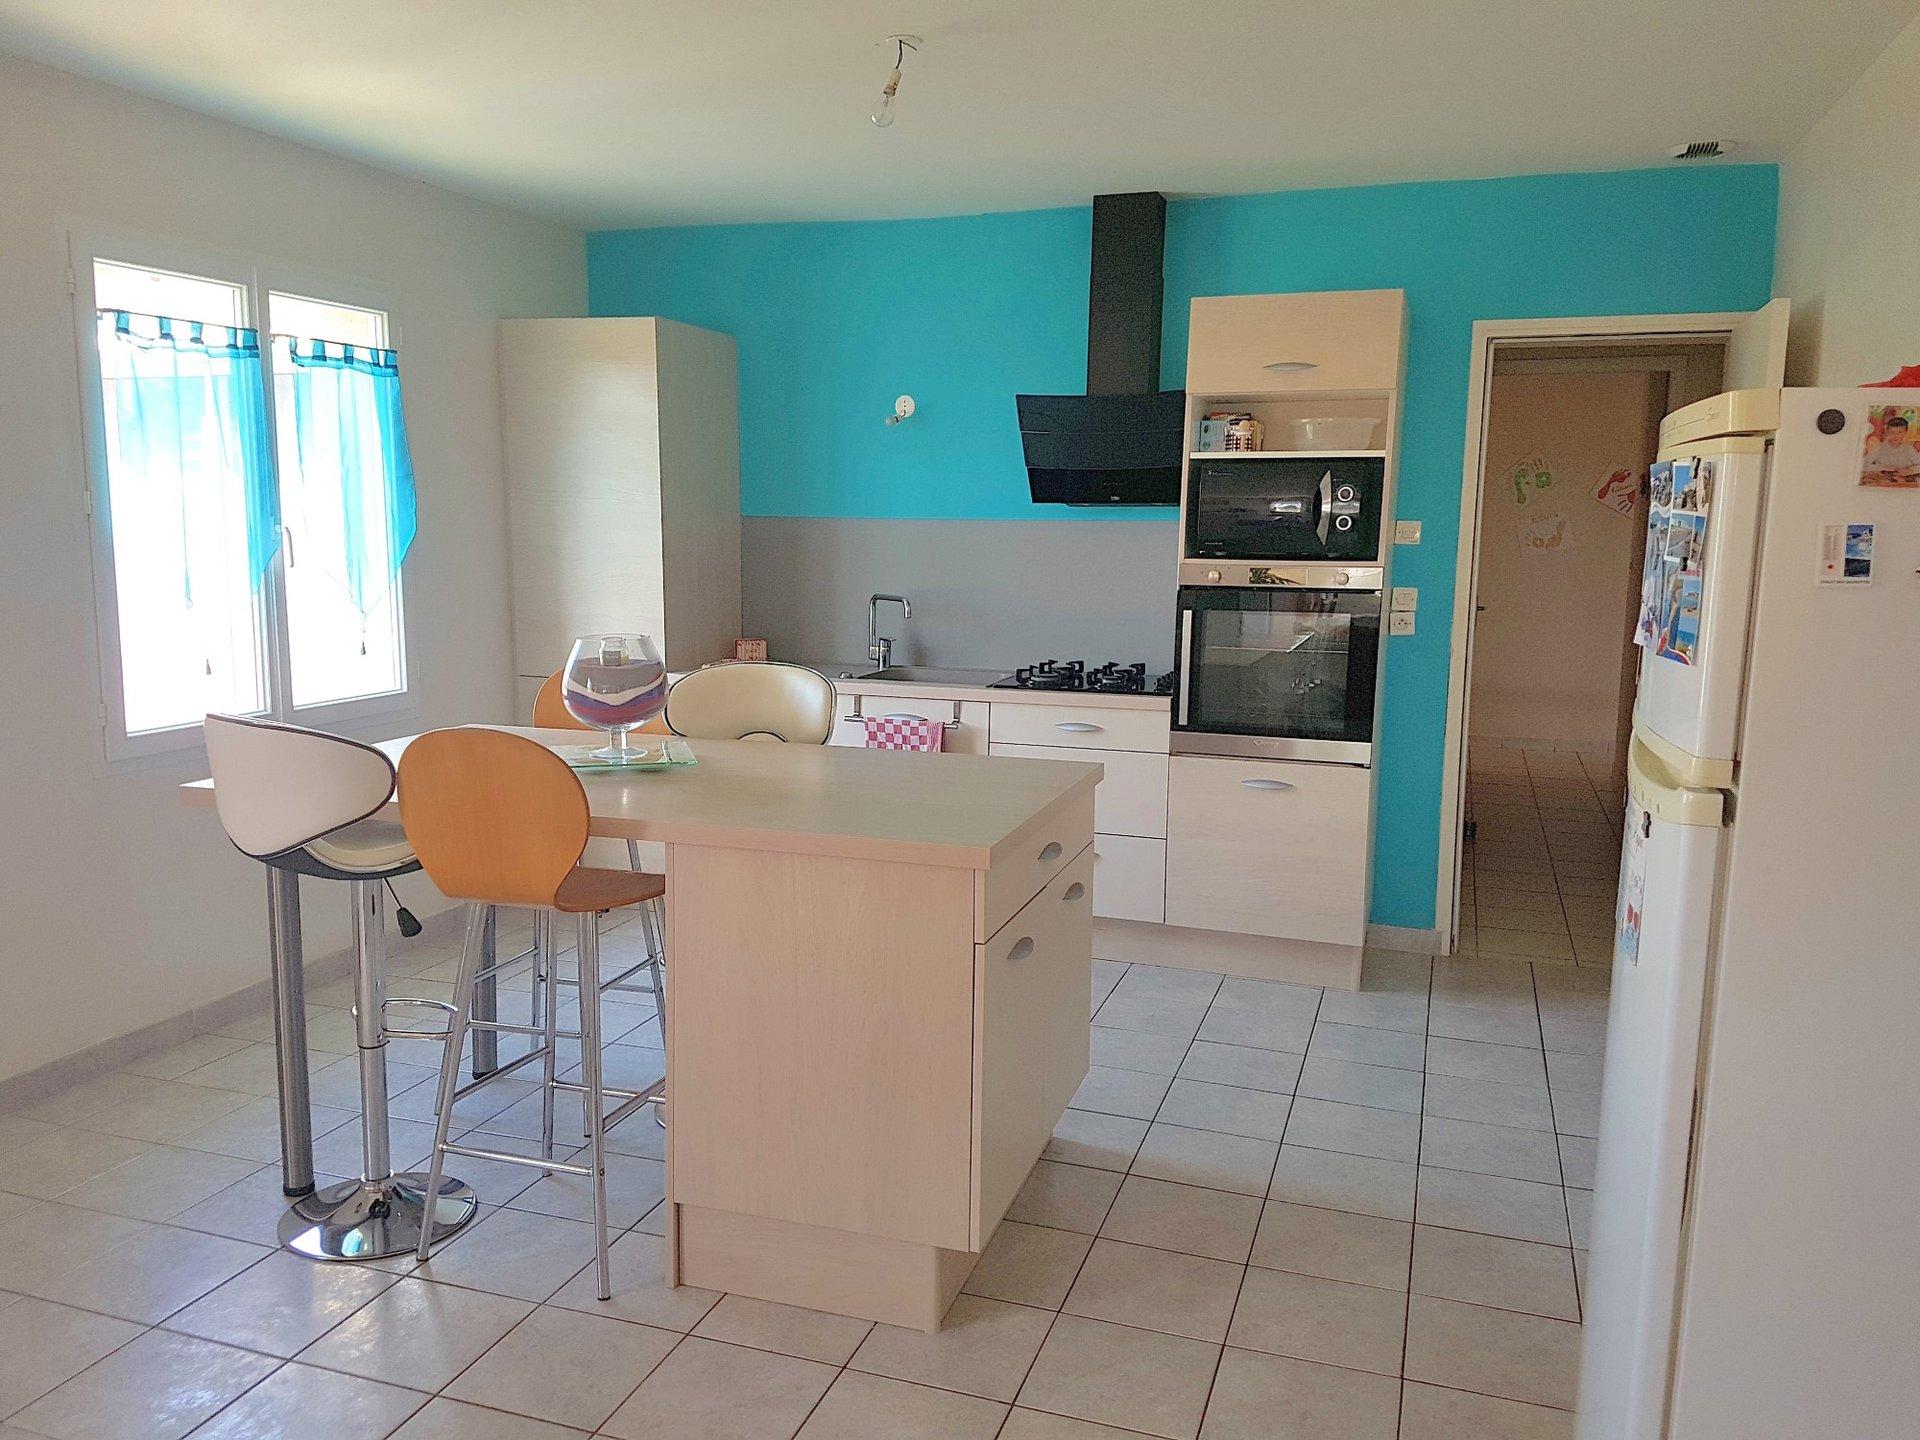 La Brenne, Indre 36: recente woning met bouwgrond